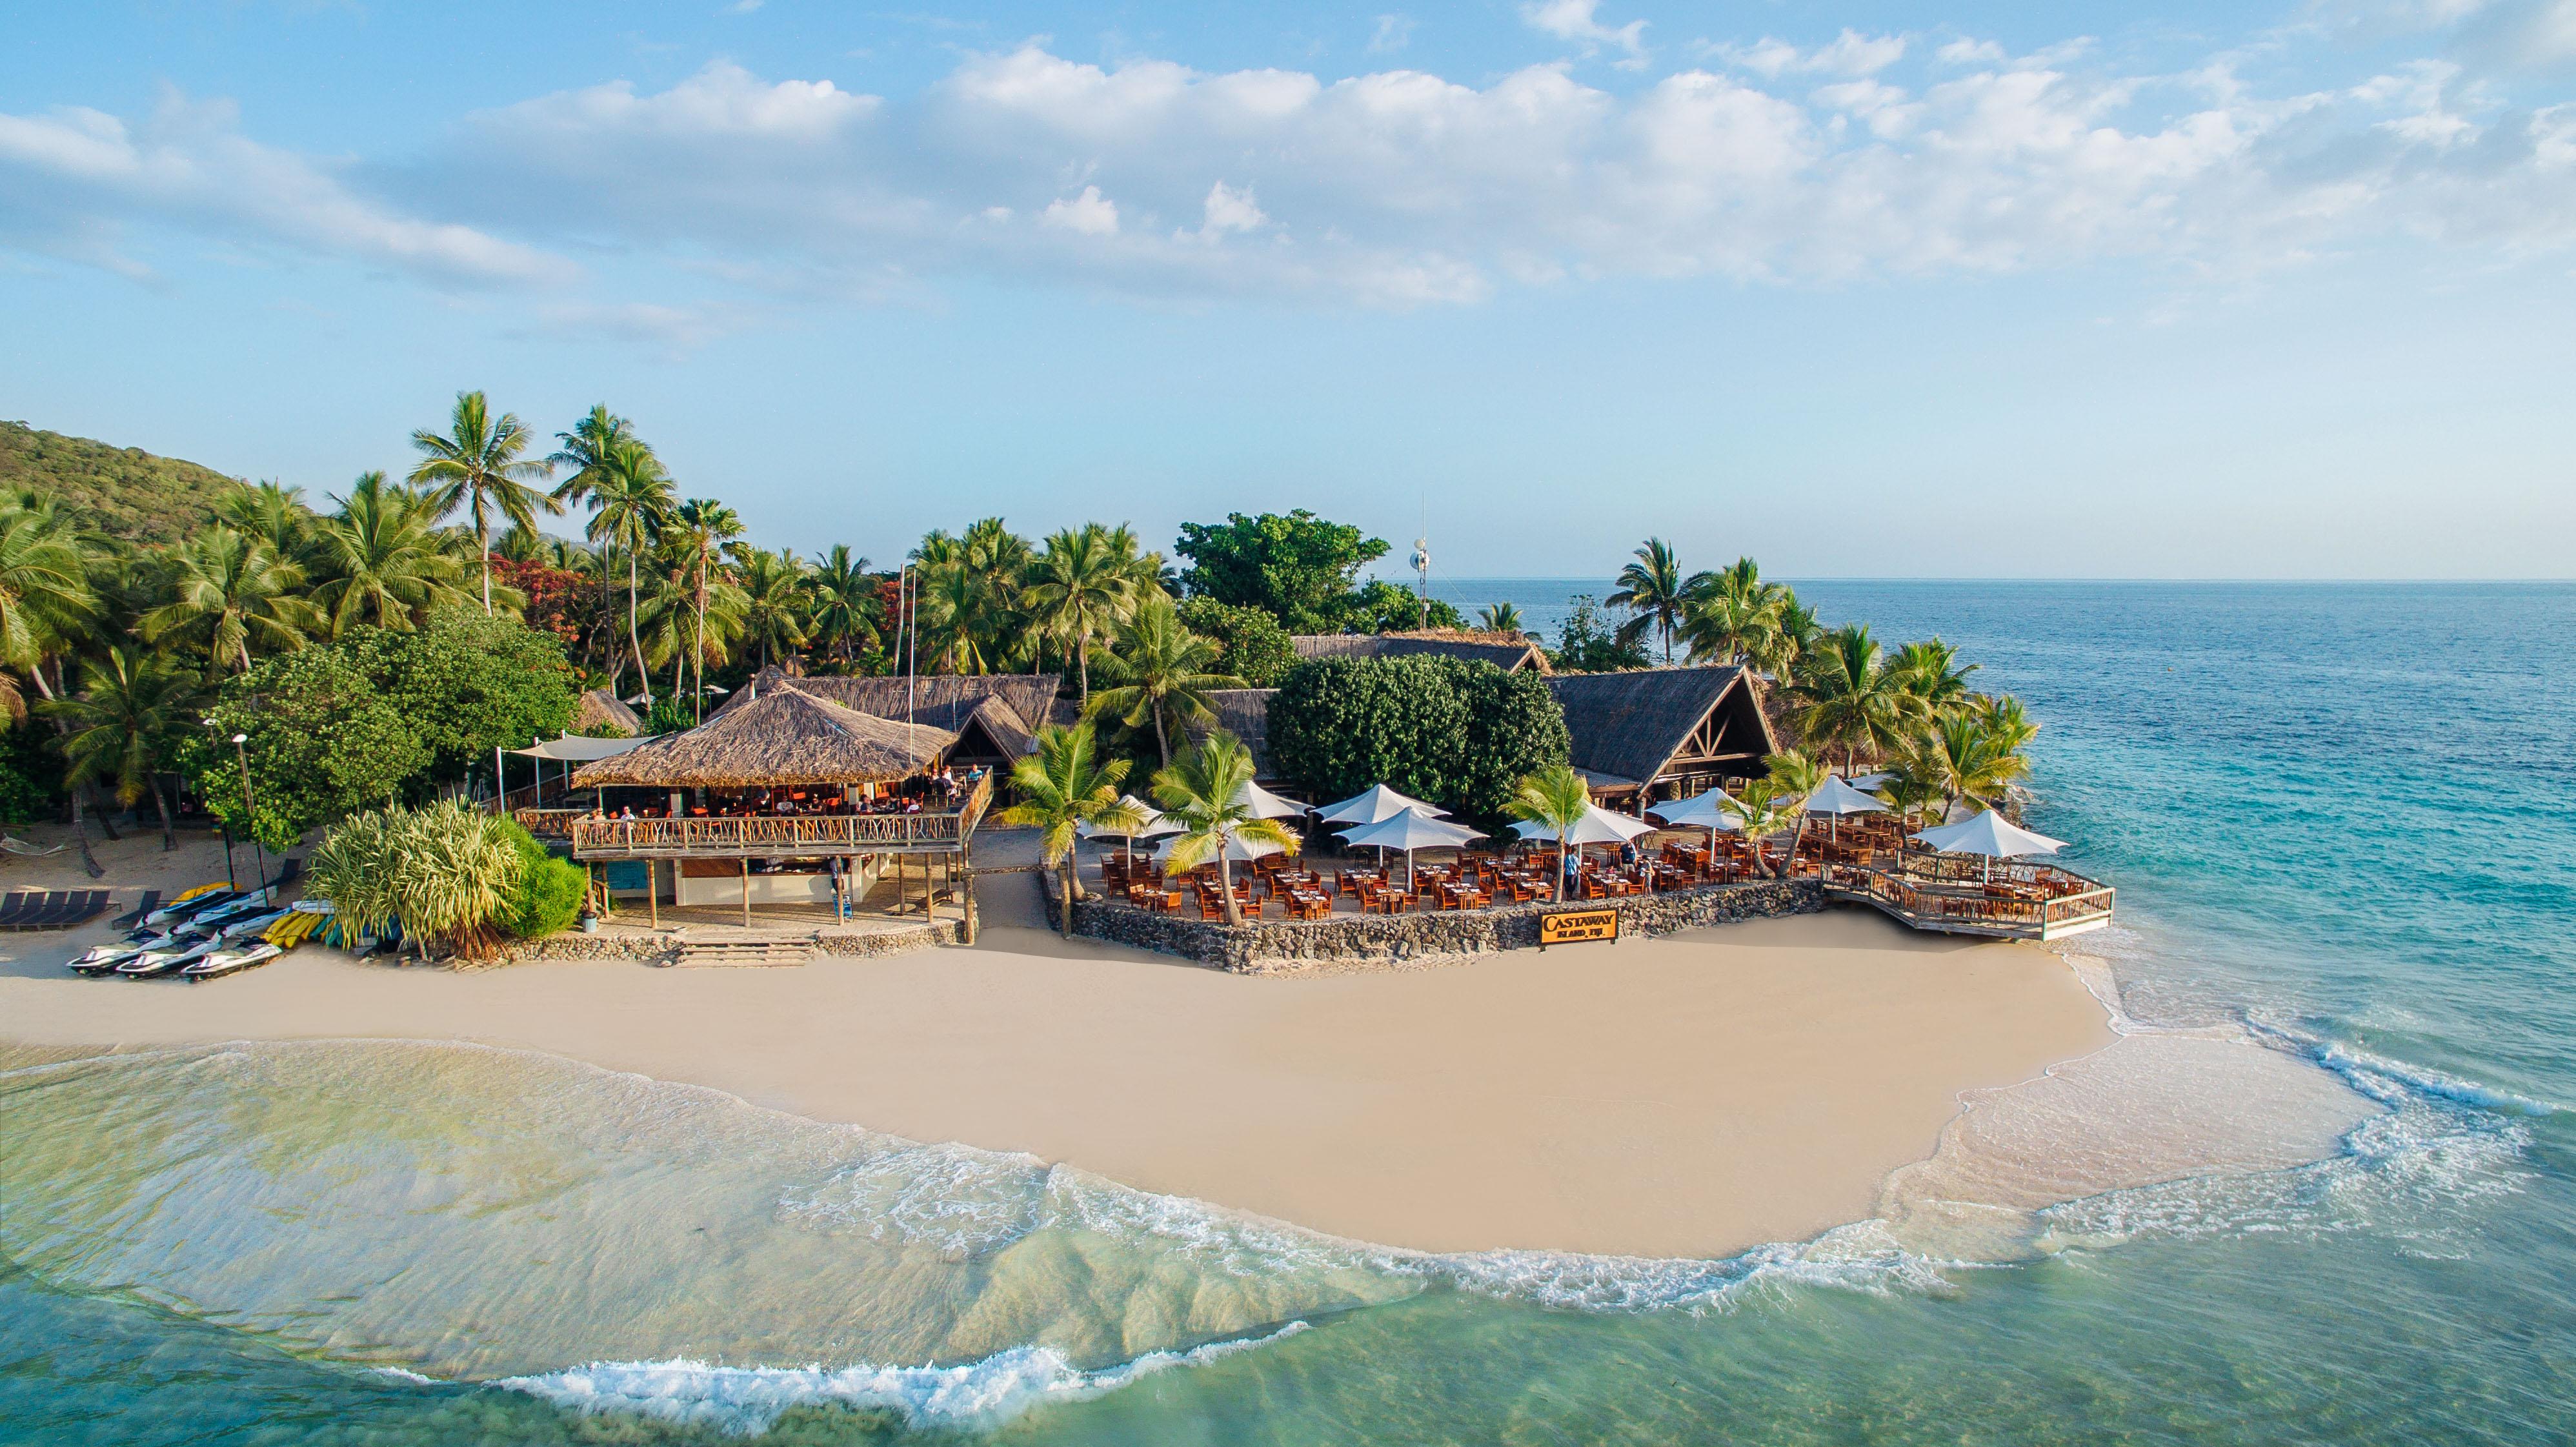 5c121fc378622-castaway_island_resort_4